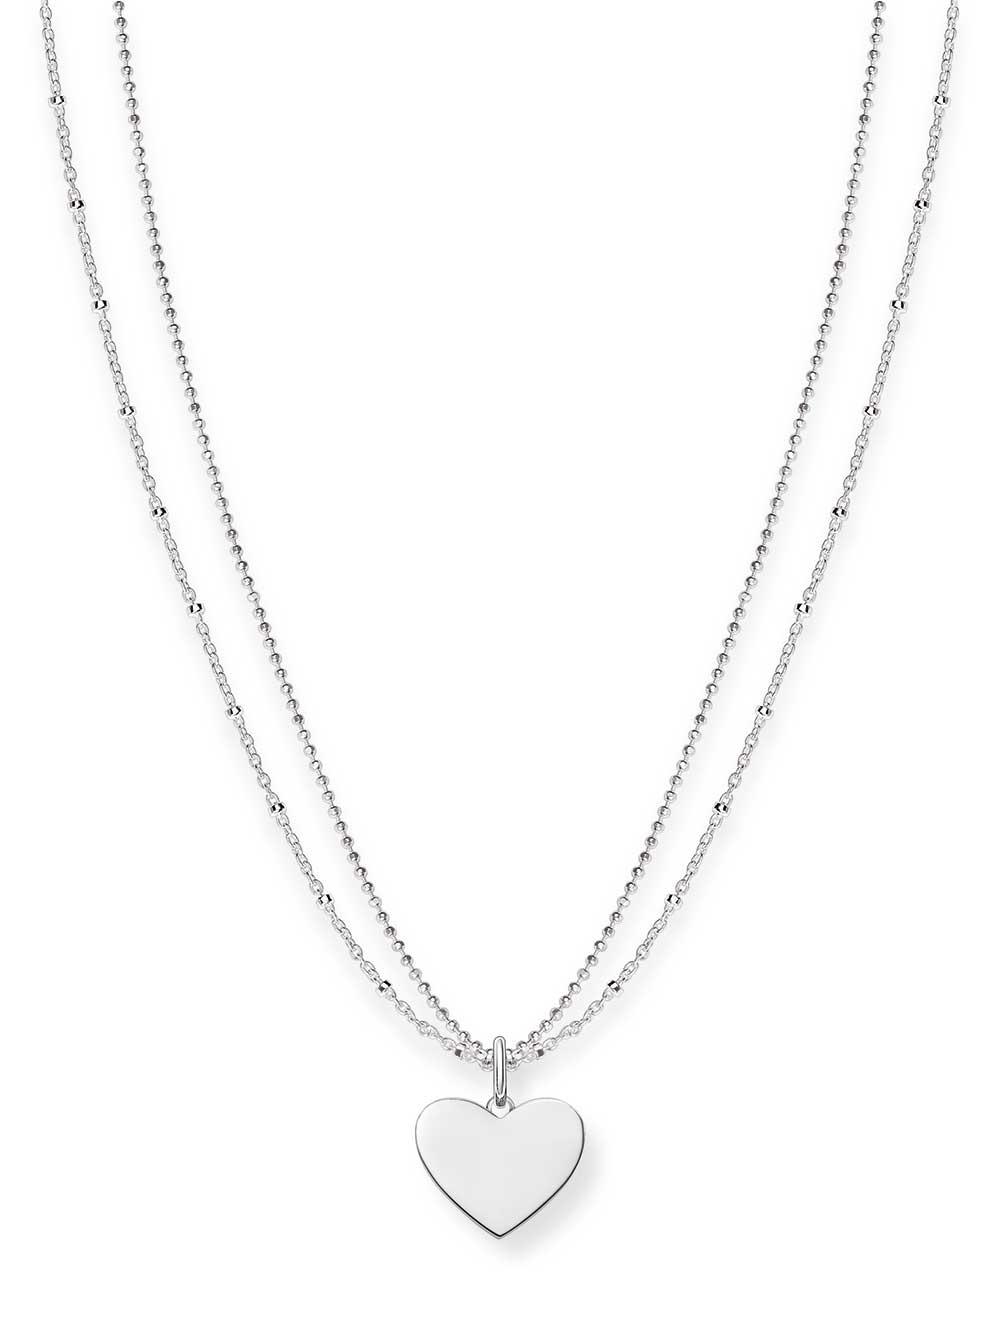 Thomas Sabo Halskette LBKE0004-001-12 925er mit Anhänger Herz 40-45cm